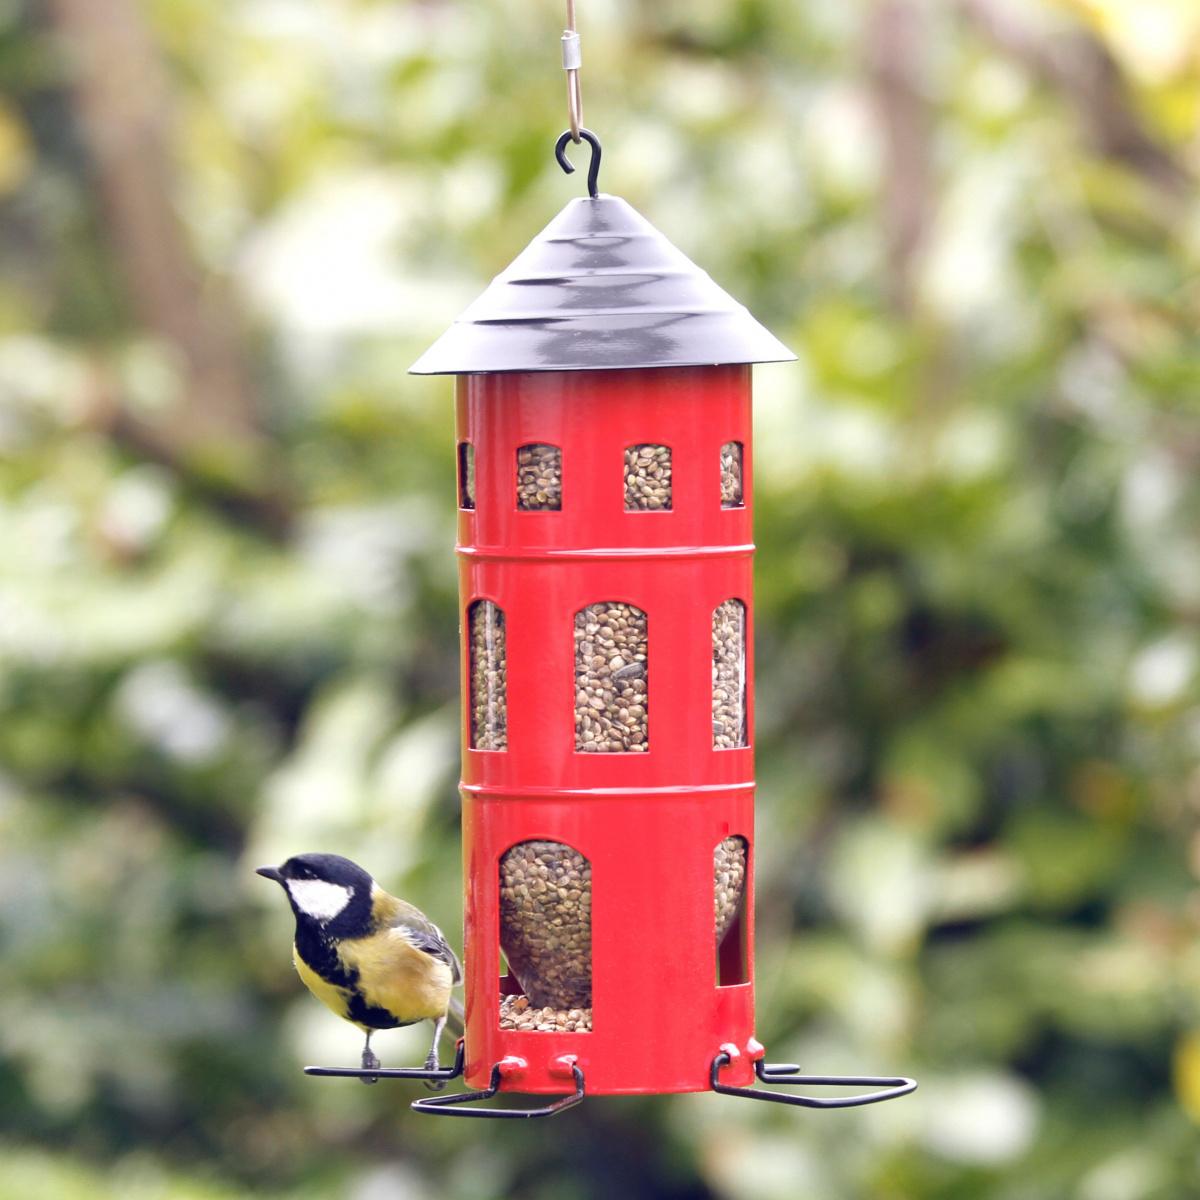 Wildlife Garden foderautomat til frø - rød